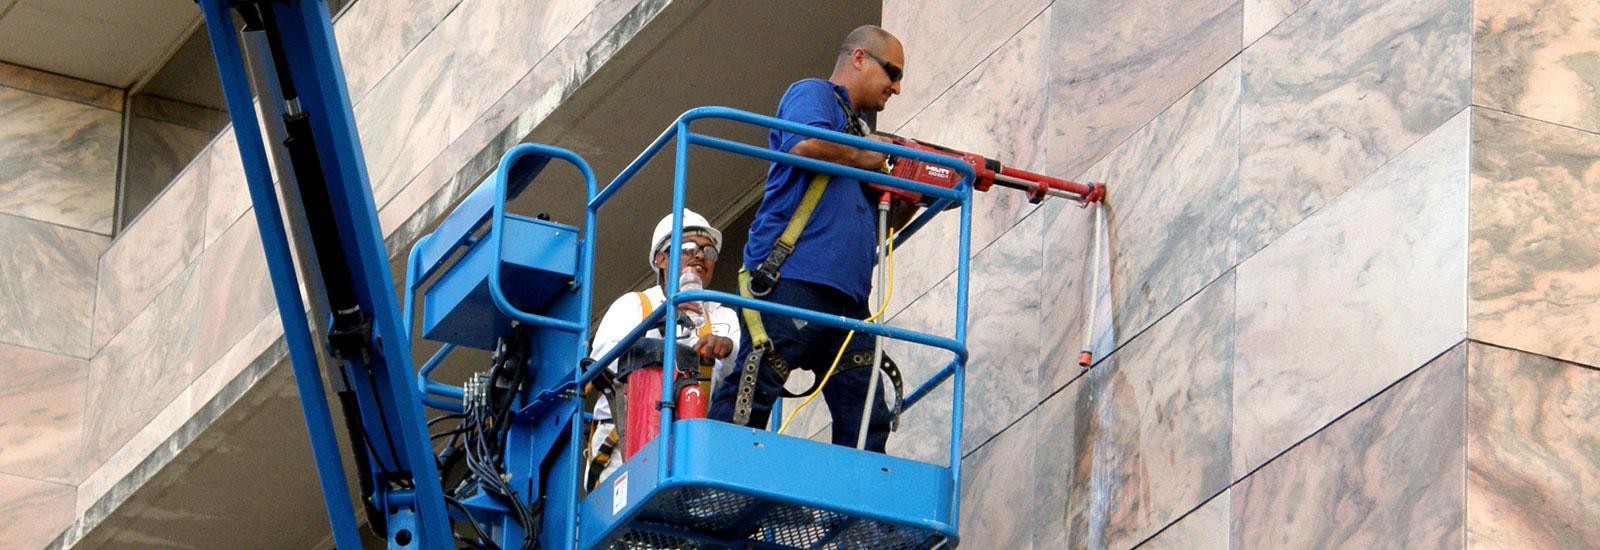 Façade Assessment, Repair and Recladding